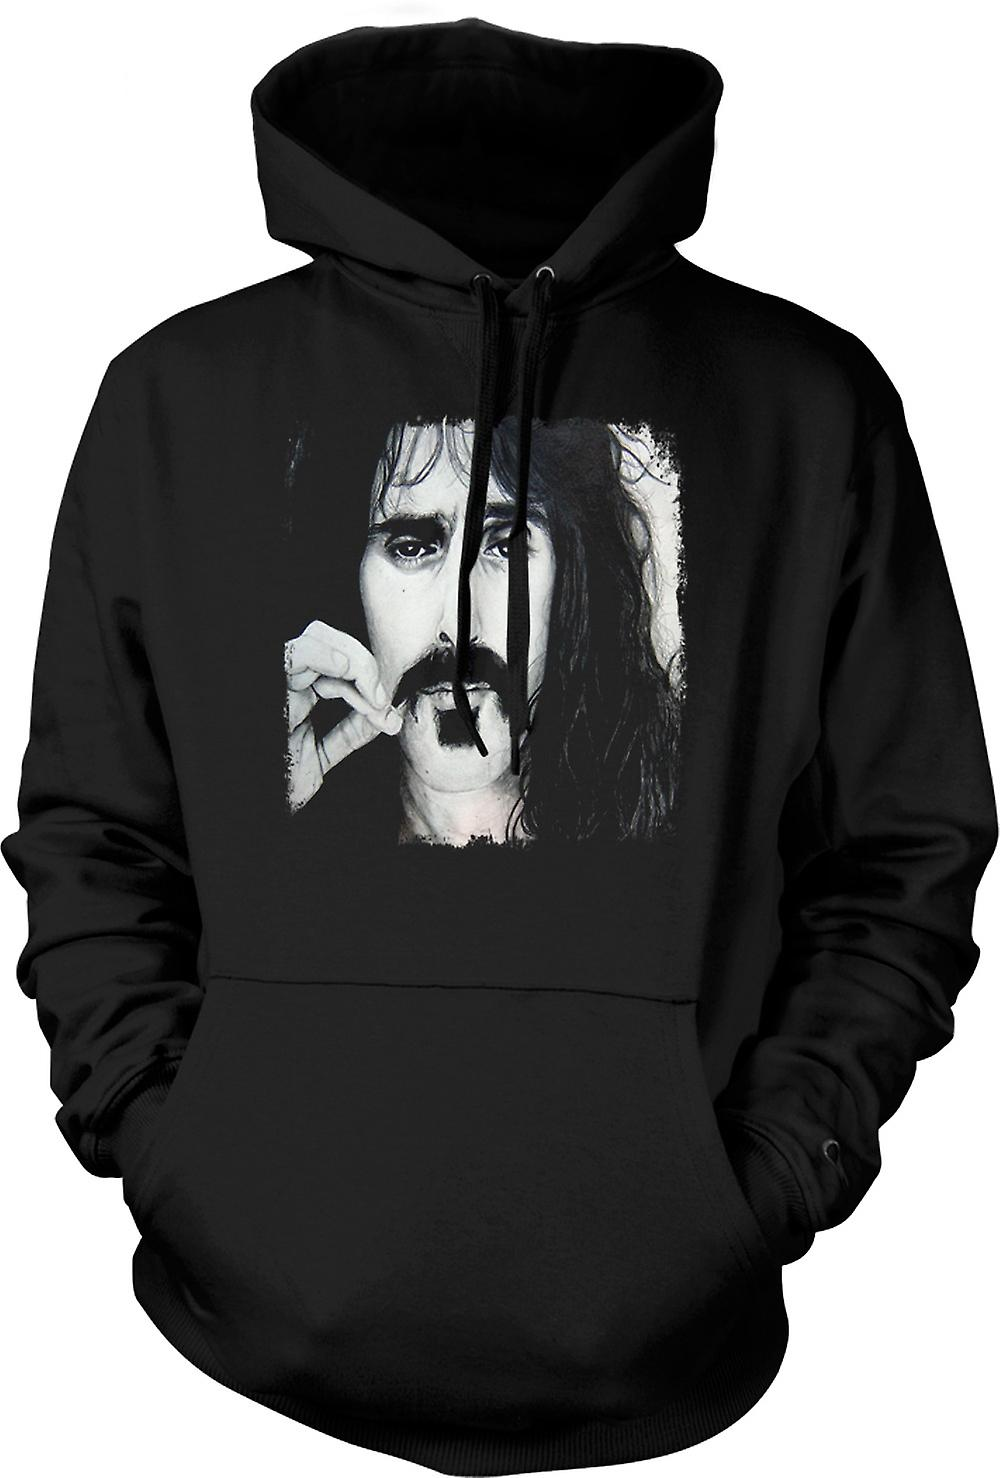 Barna hettegenser - Frank Zappa - portrett skisse